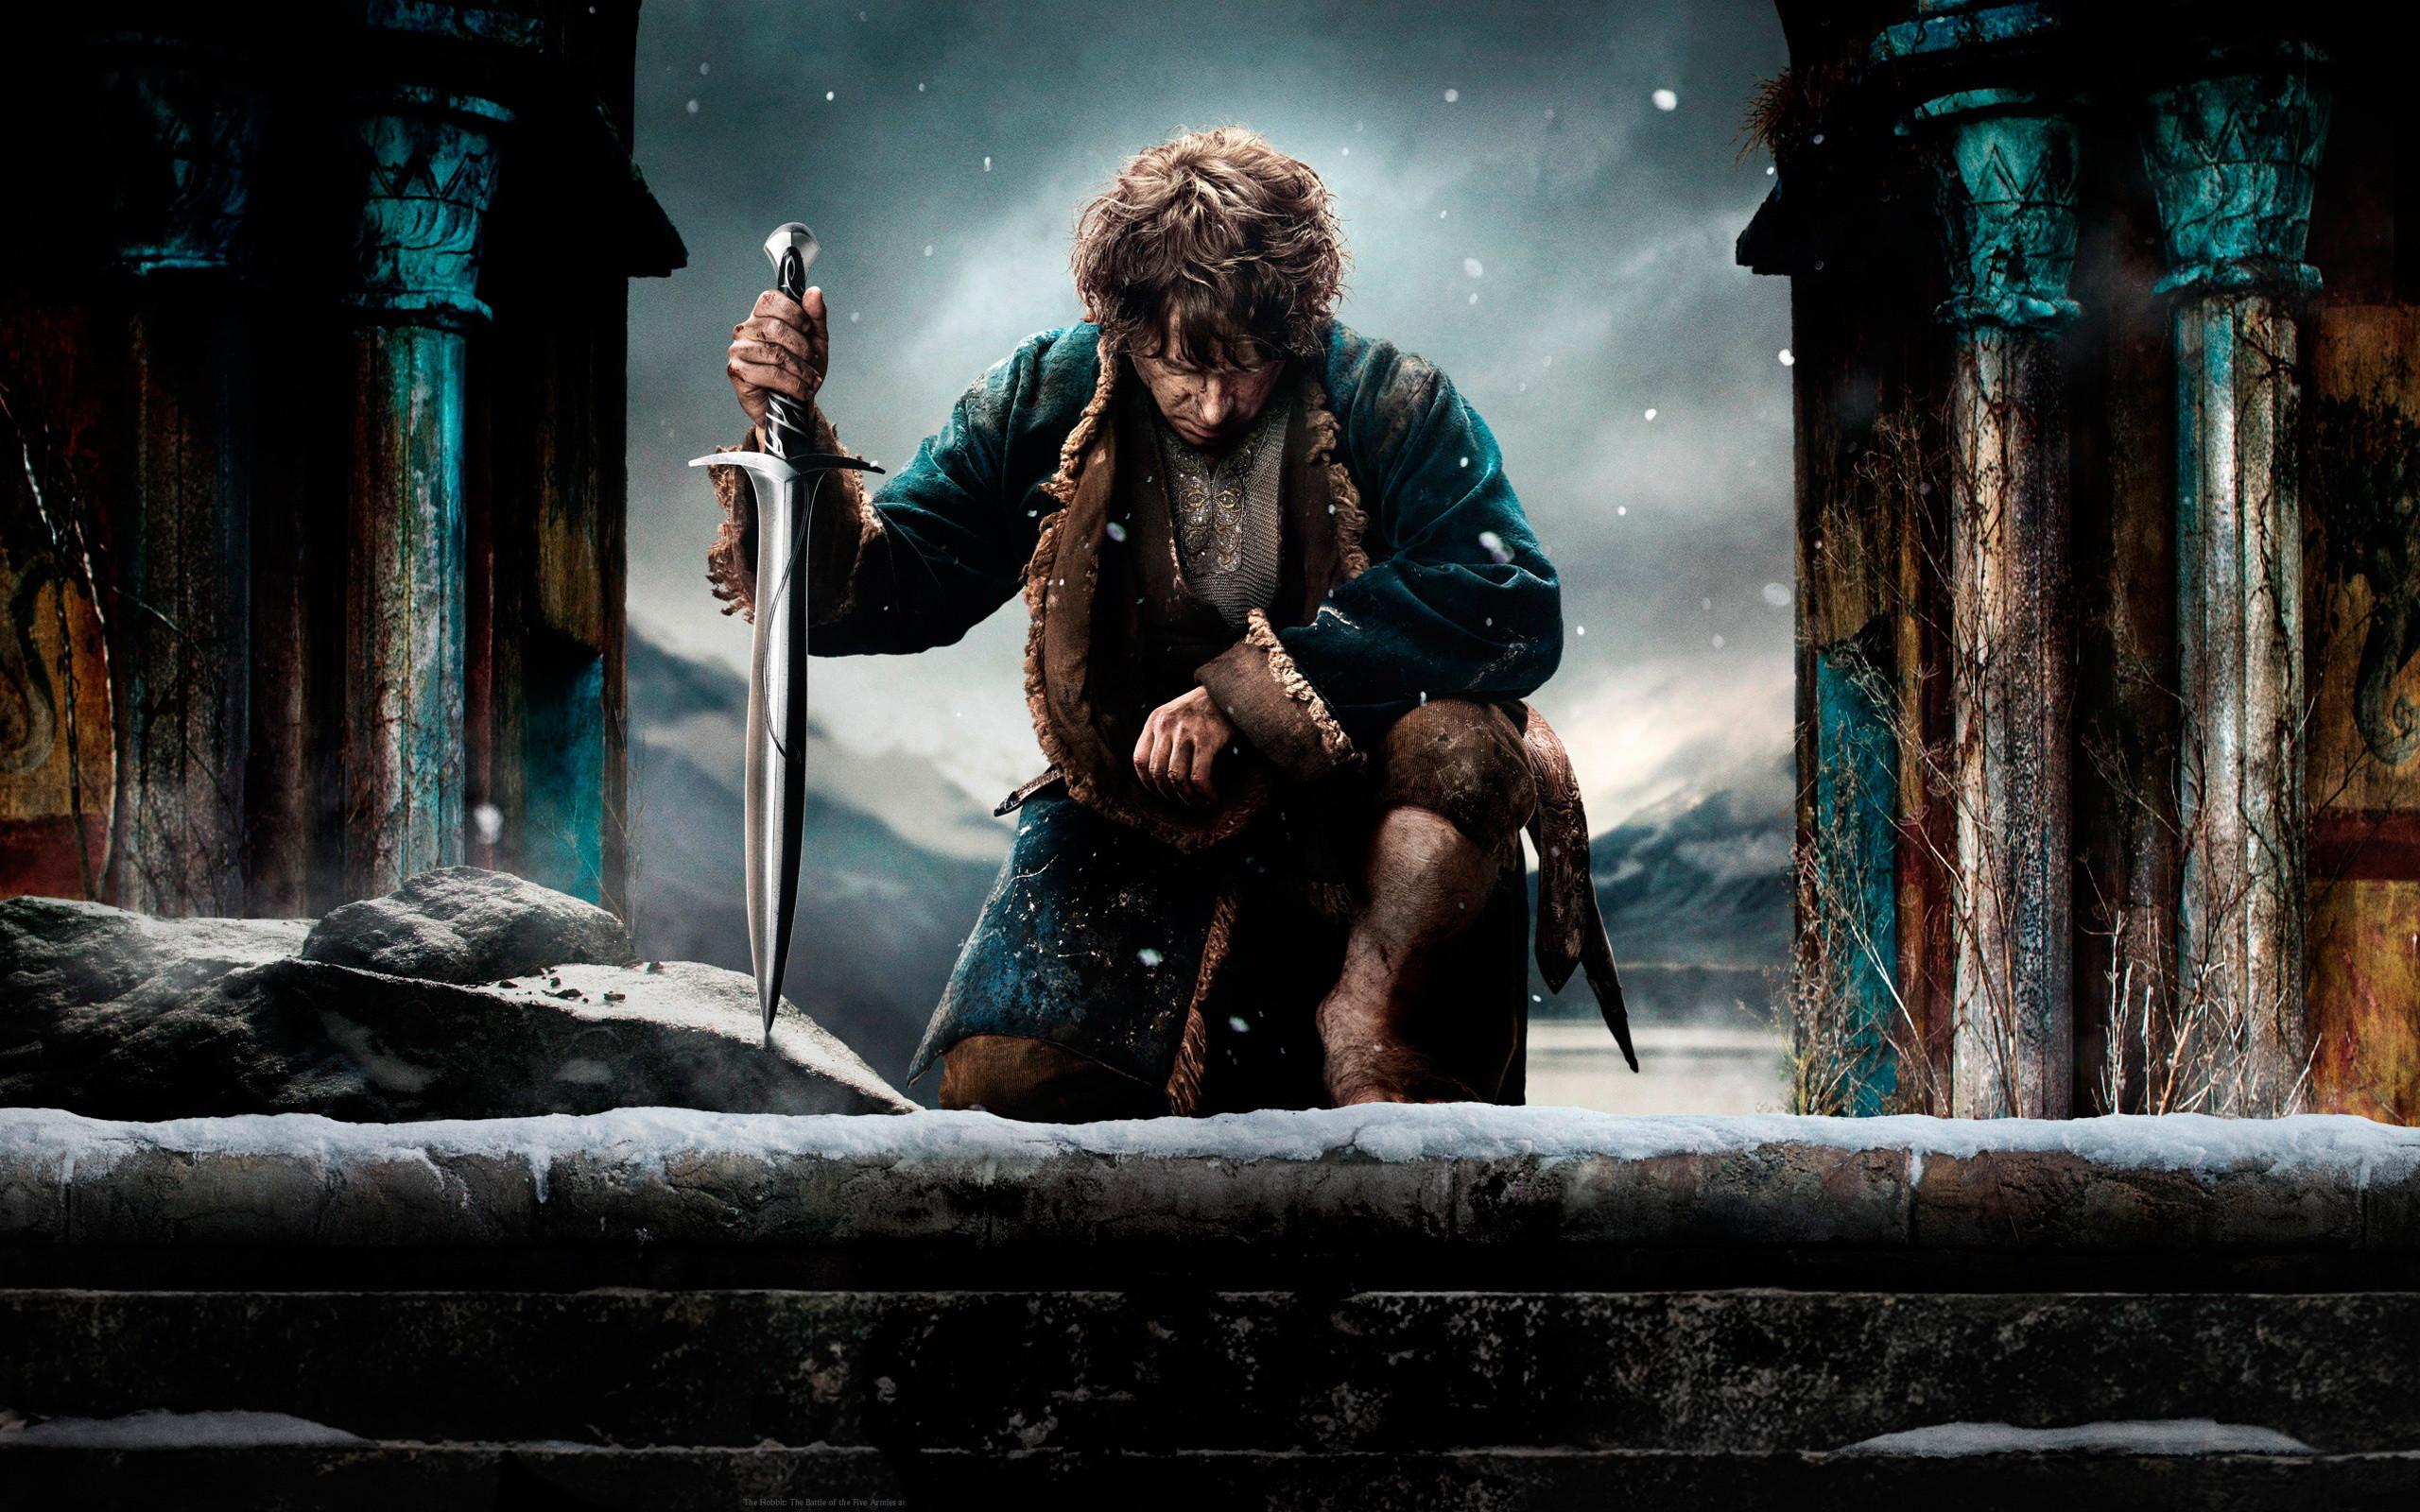 the hobbit wallpaper hd 183��